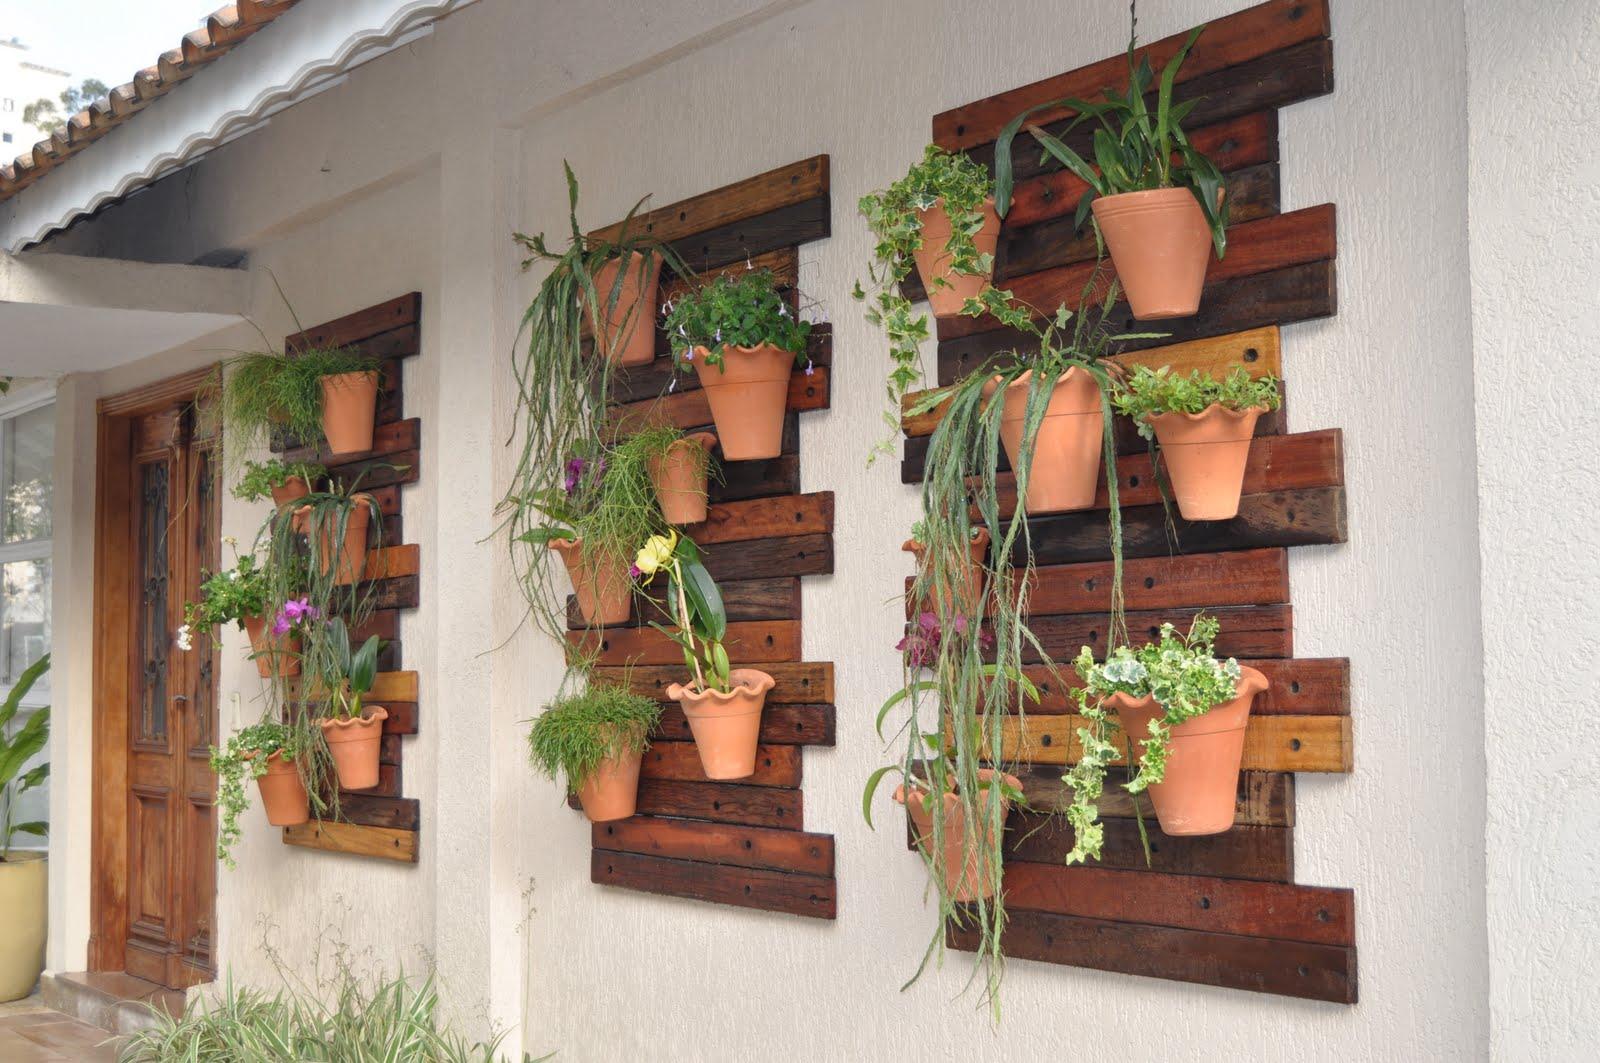 jardim vertical simples:Vertical Wall Garden